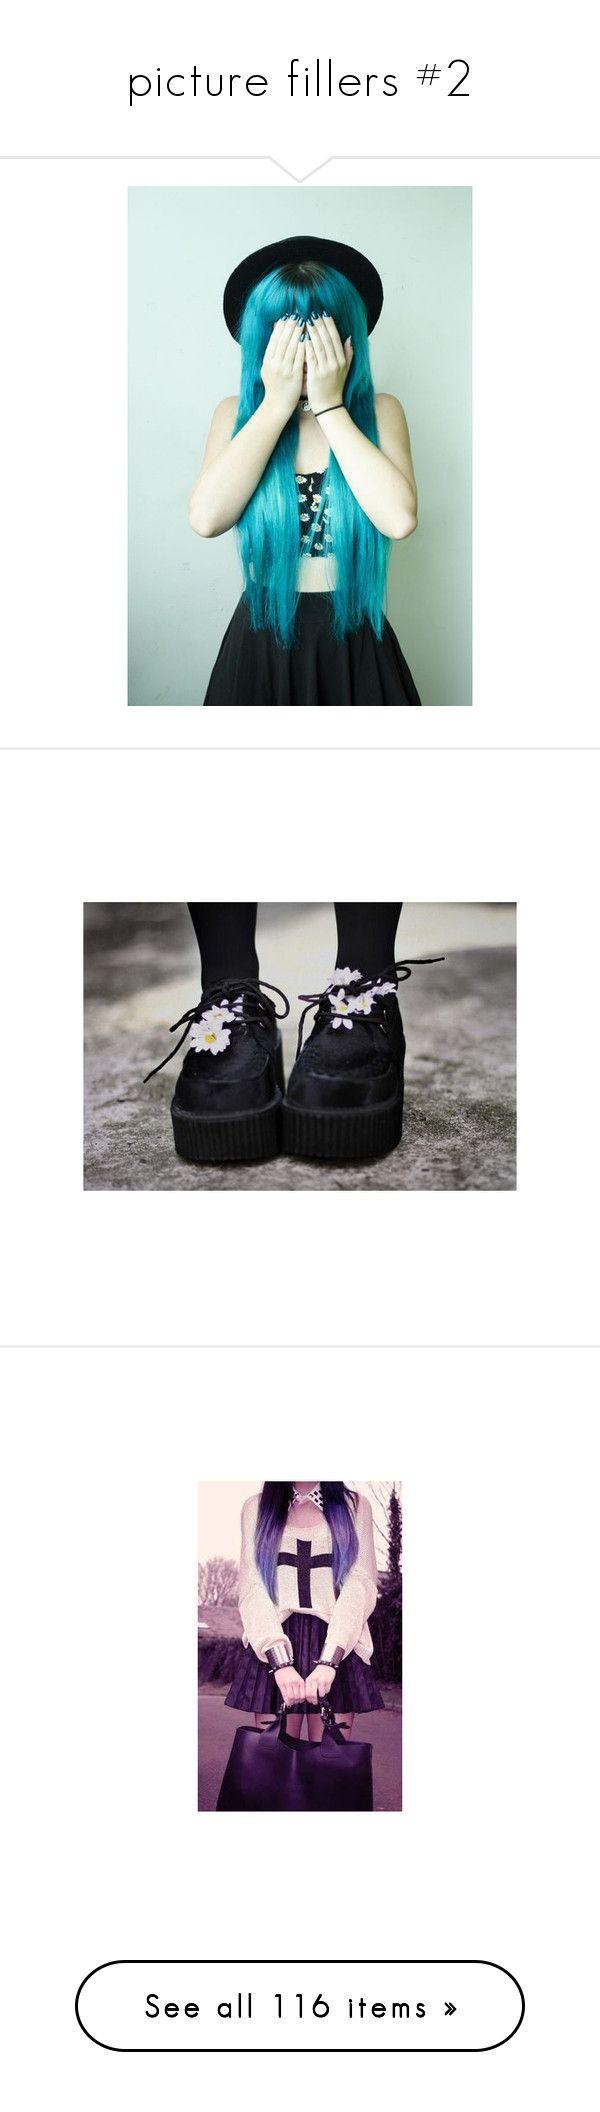 """picture fillers #2"" by sleeping-kellin ❤ liked on Polyvore featuring hair, pants, leggings, skeleton print leggings, goth pants, skull leggings, pastel pants, pastel goth leggings, backgrounds and pictures"